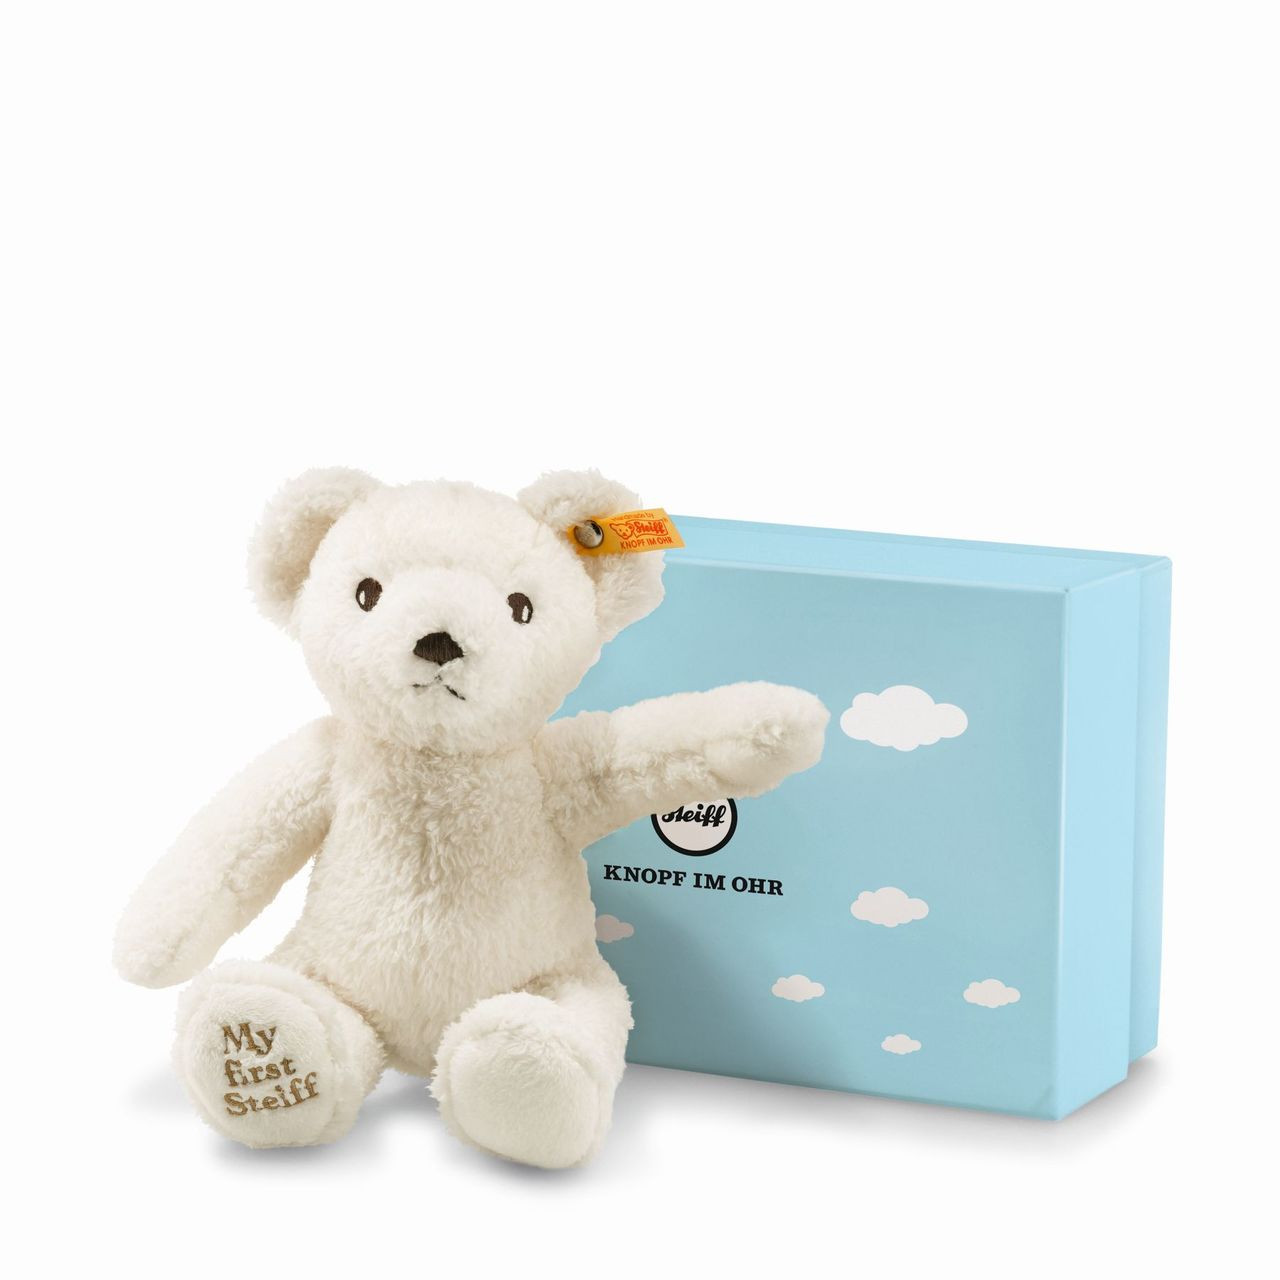 9dcc6ba8da3 My First Steiff in Gift Box